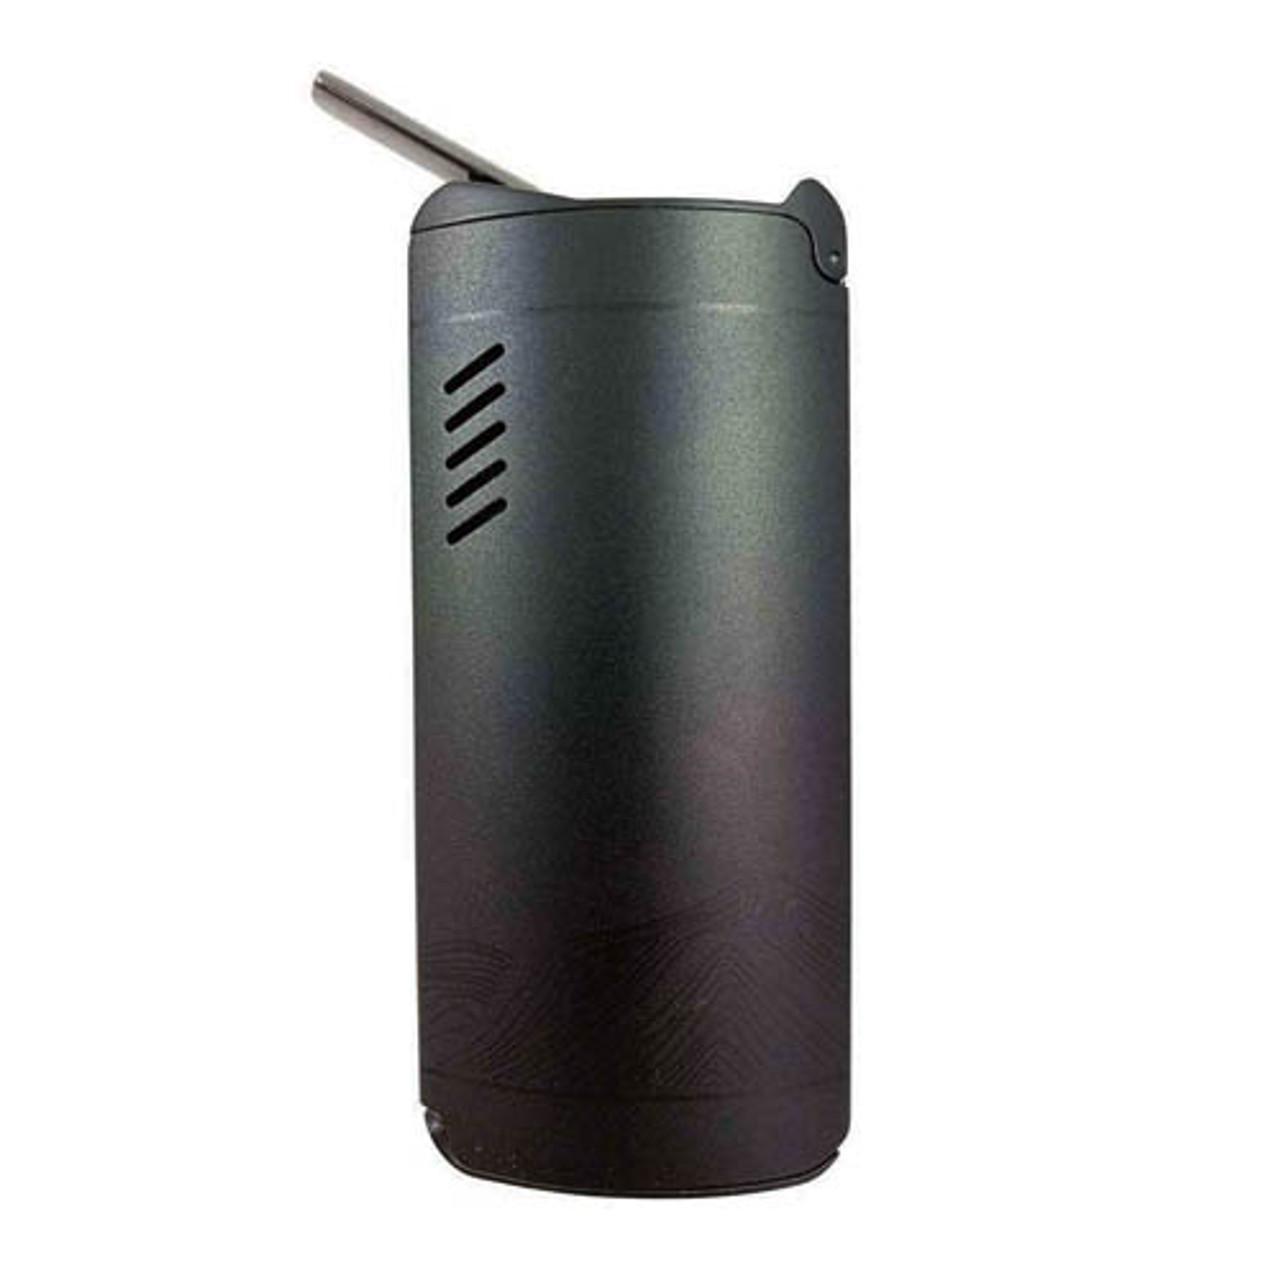 XVape Fog Portable Vaporizer